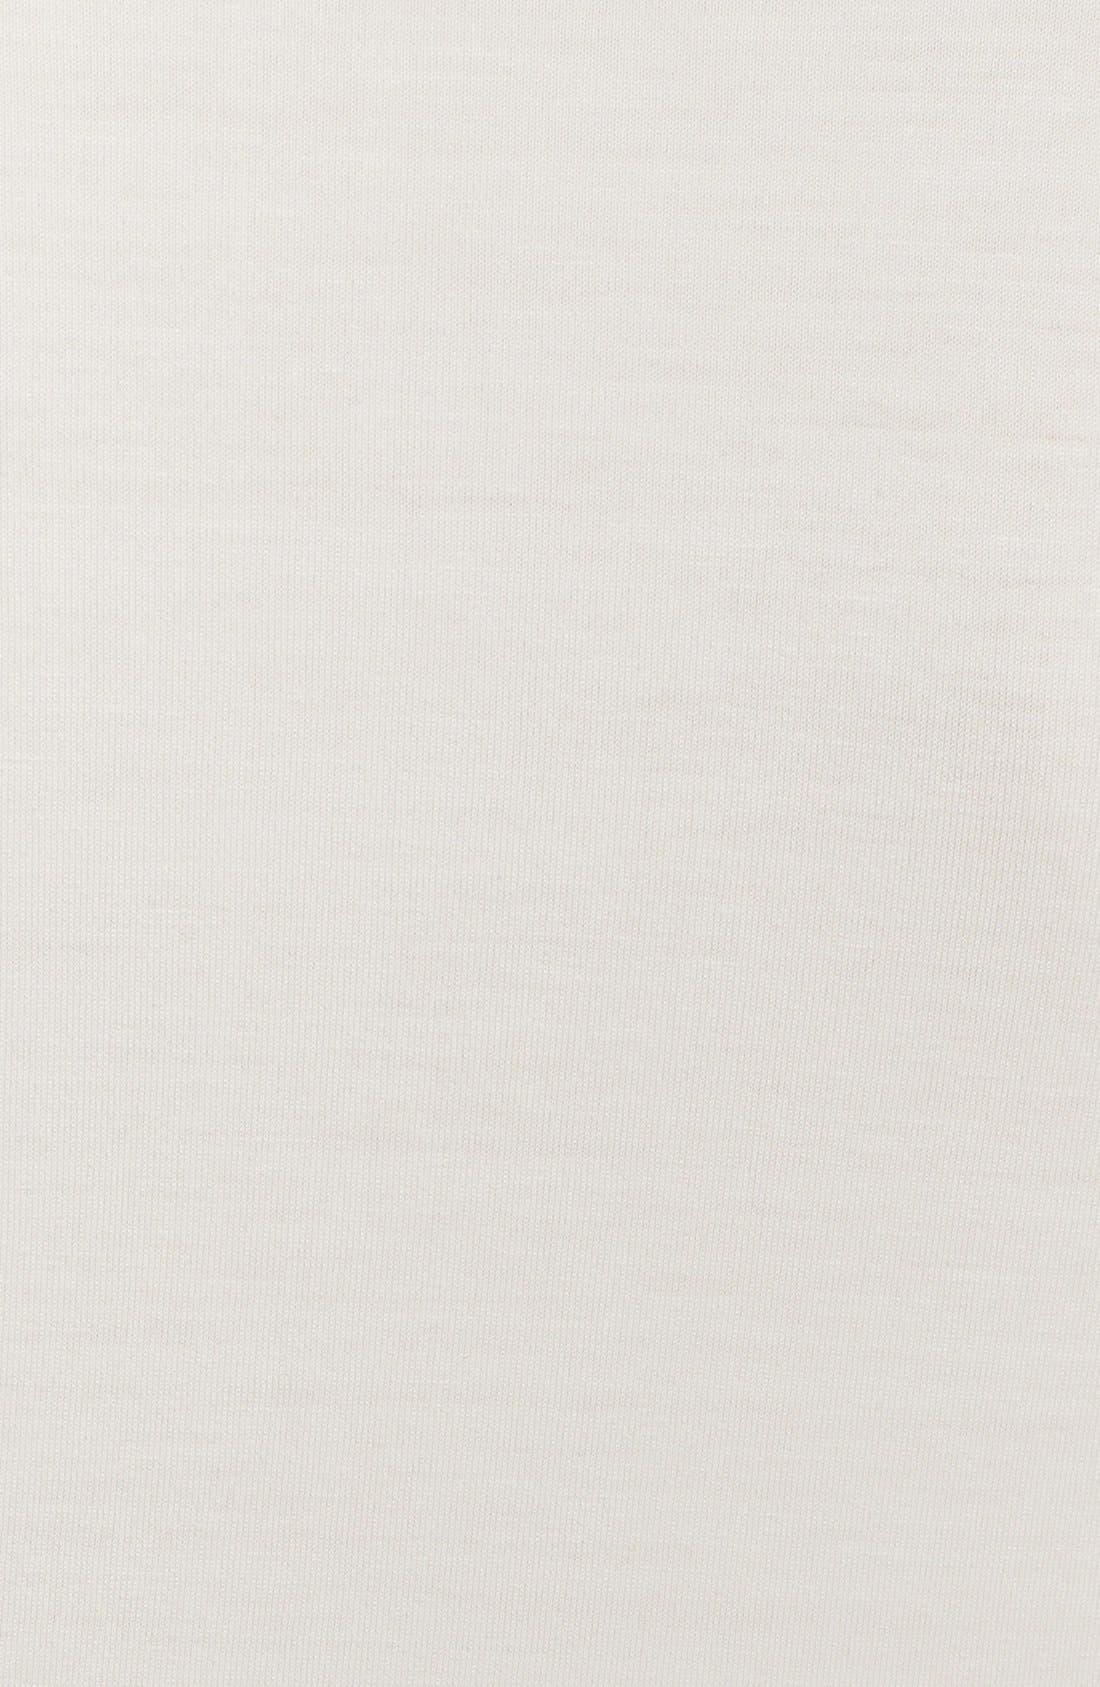 Alternate Image 3  - Max Mara 'Caprice' Surplice Jersey Top